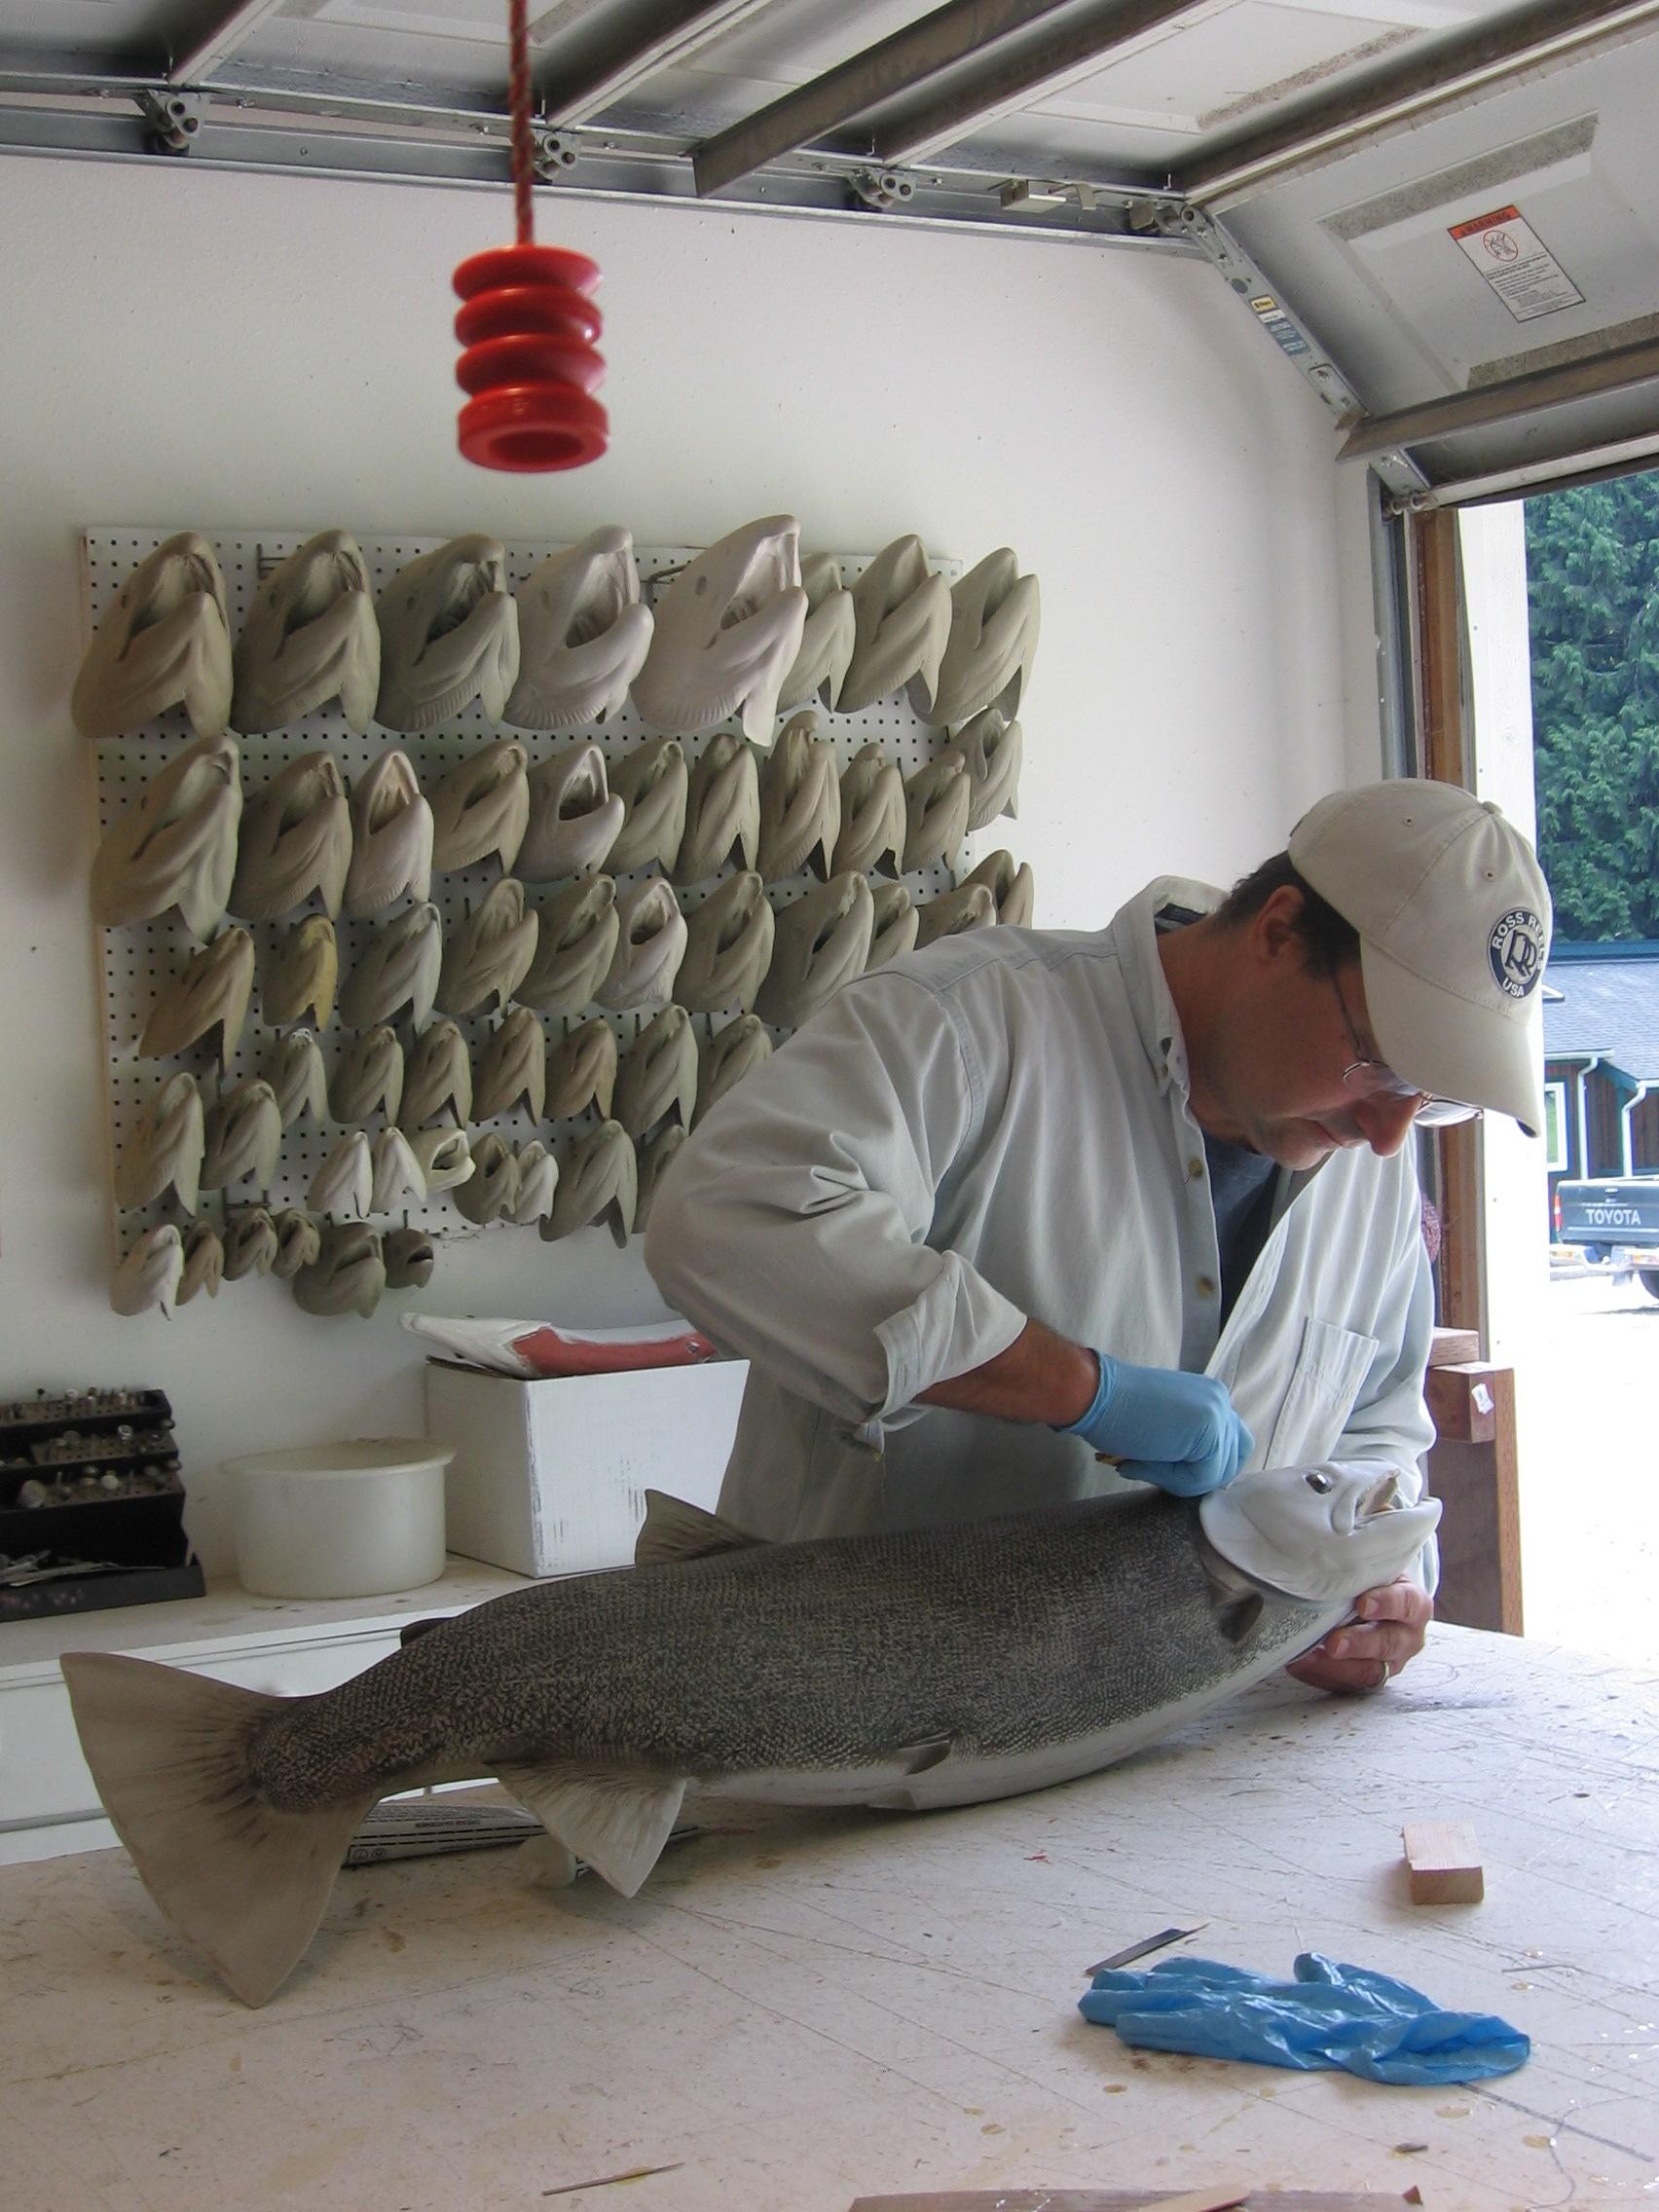 Luke Filmer of Blackwater Fish Replicas working on custom steelhead blank